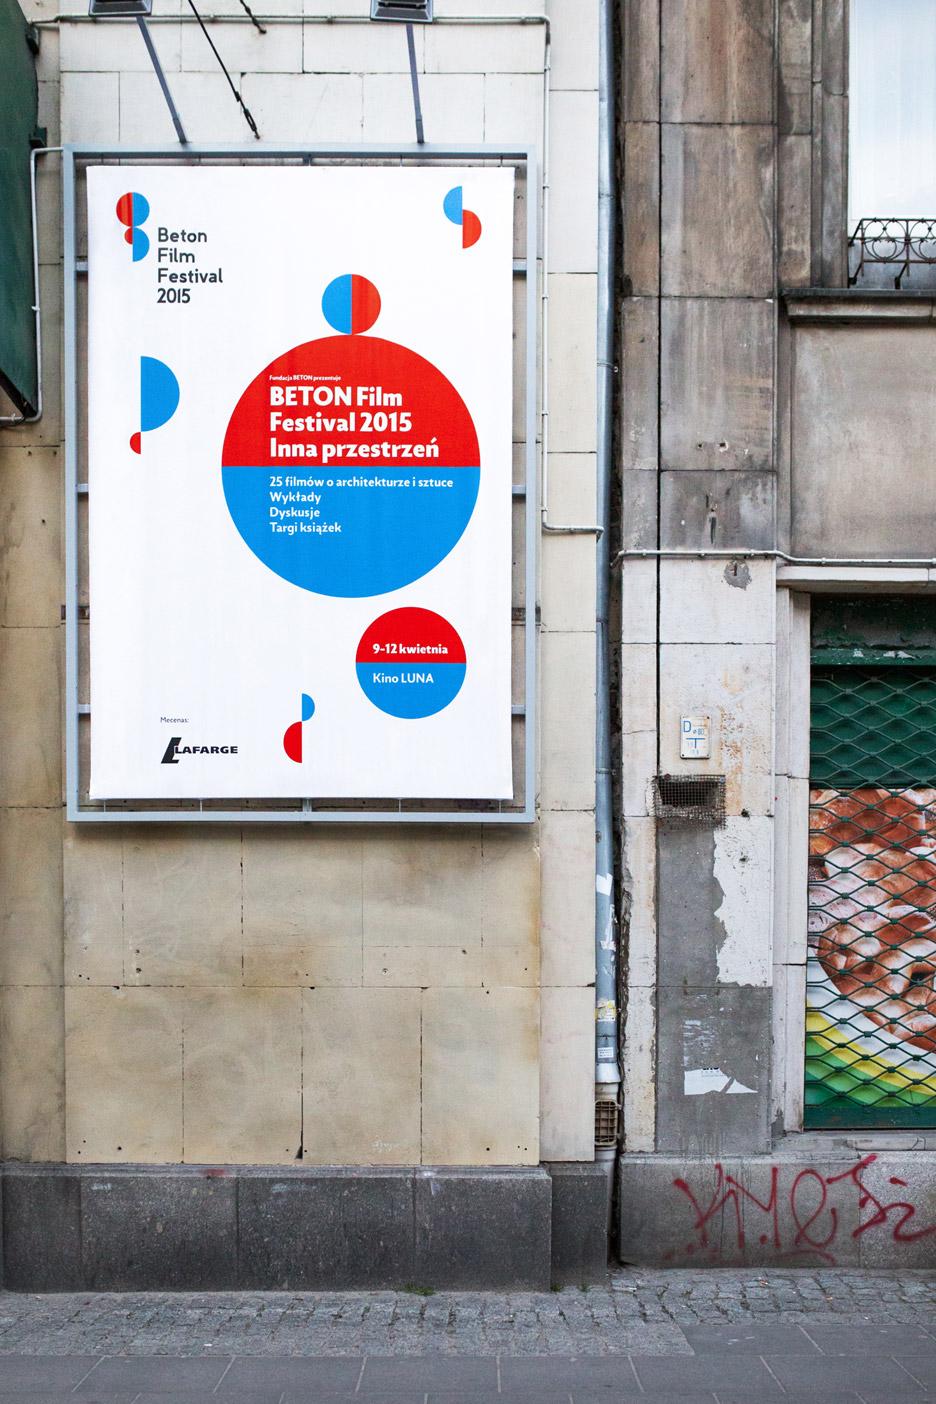 Warsaw's Beton film festival brand identity by UVMW